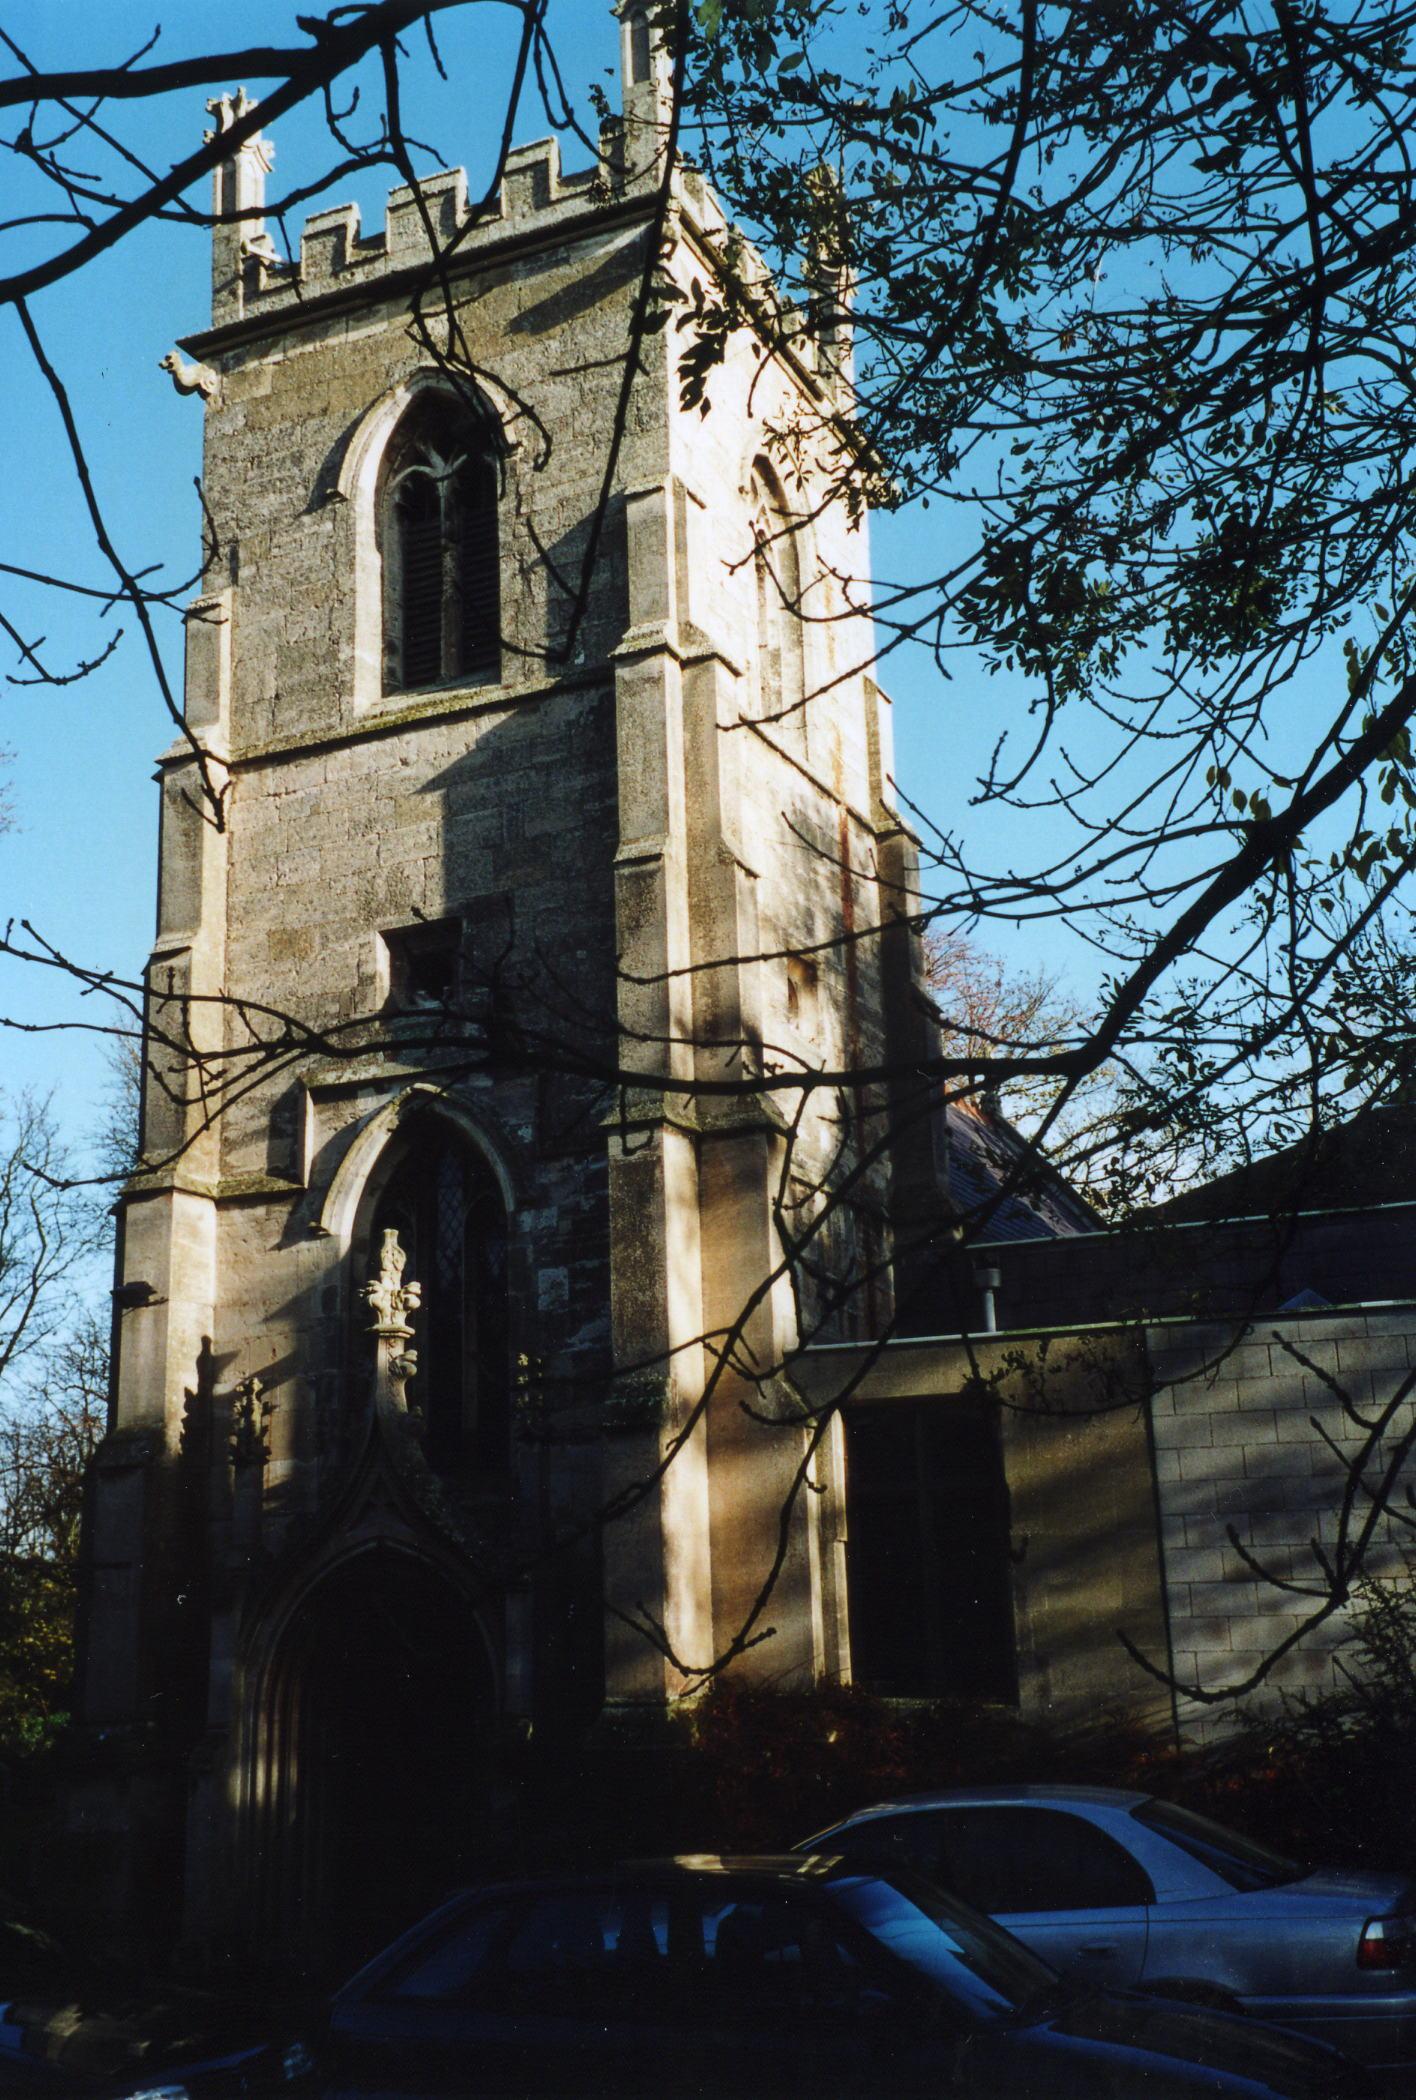 Saint Peter and Paul's Church